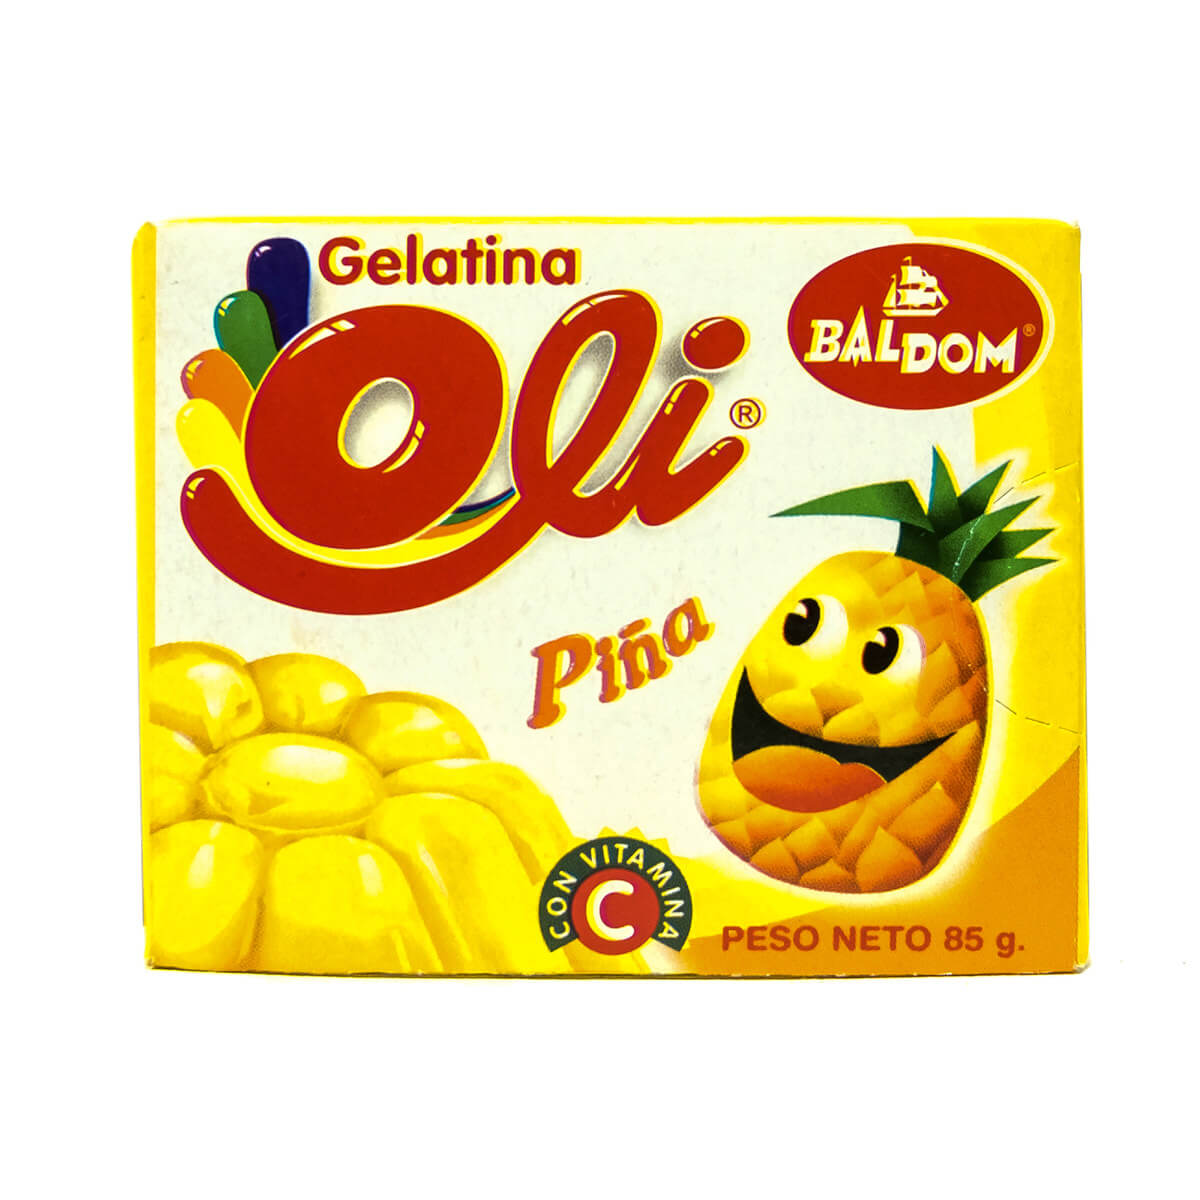 Gelatina Piña Oli